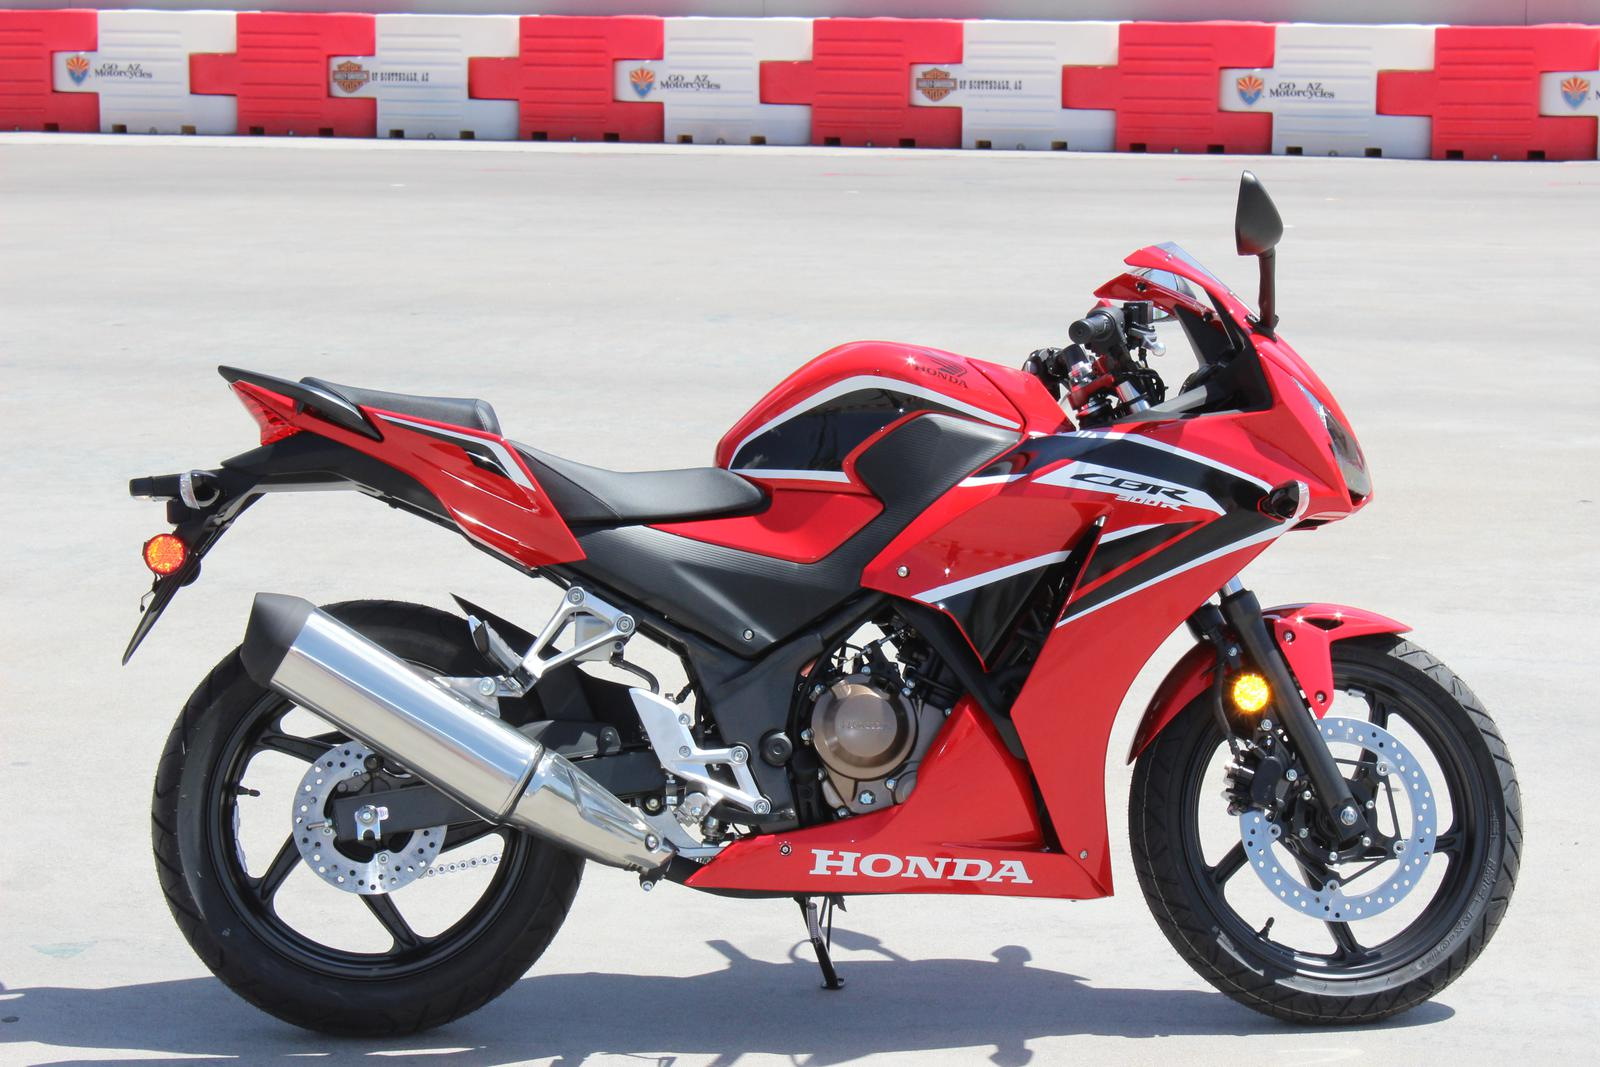 2017 honda cbr300r for sale in scottsdale, az | go az motorcycles